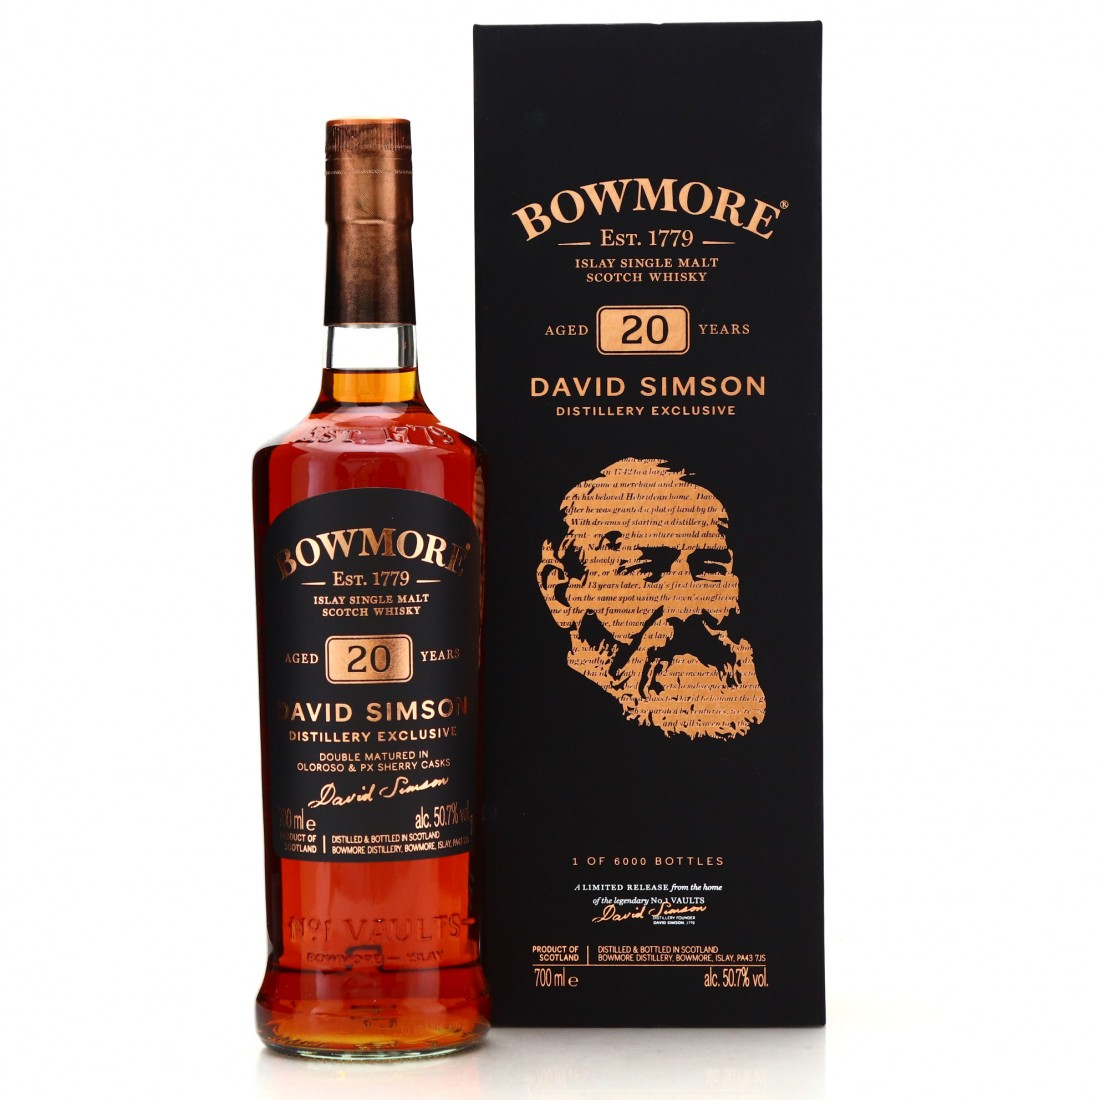 Bowmore 20 Year Old David Simson / Distillery Shop